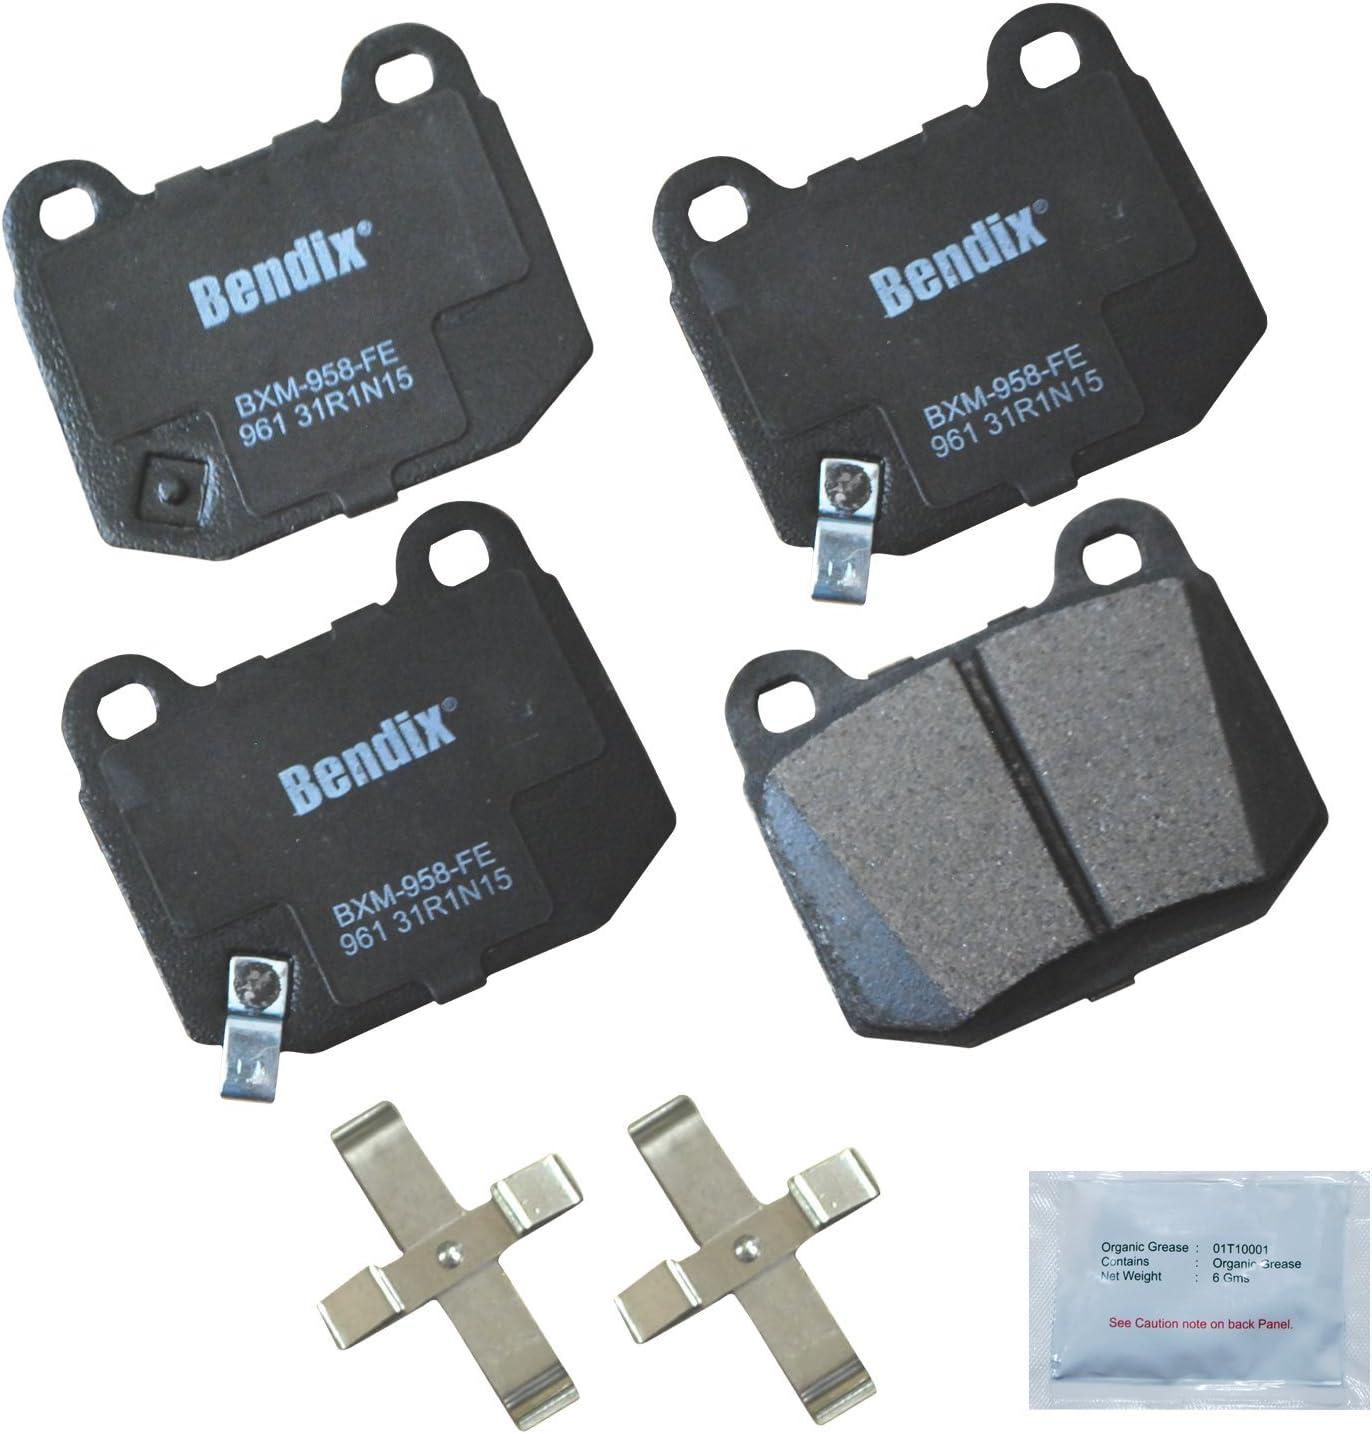 Bendix Premium Copper Free CFM1017 Semi-Metallic Brake Pad with Installation Hardware Rear